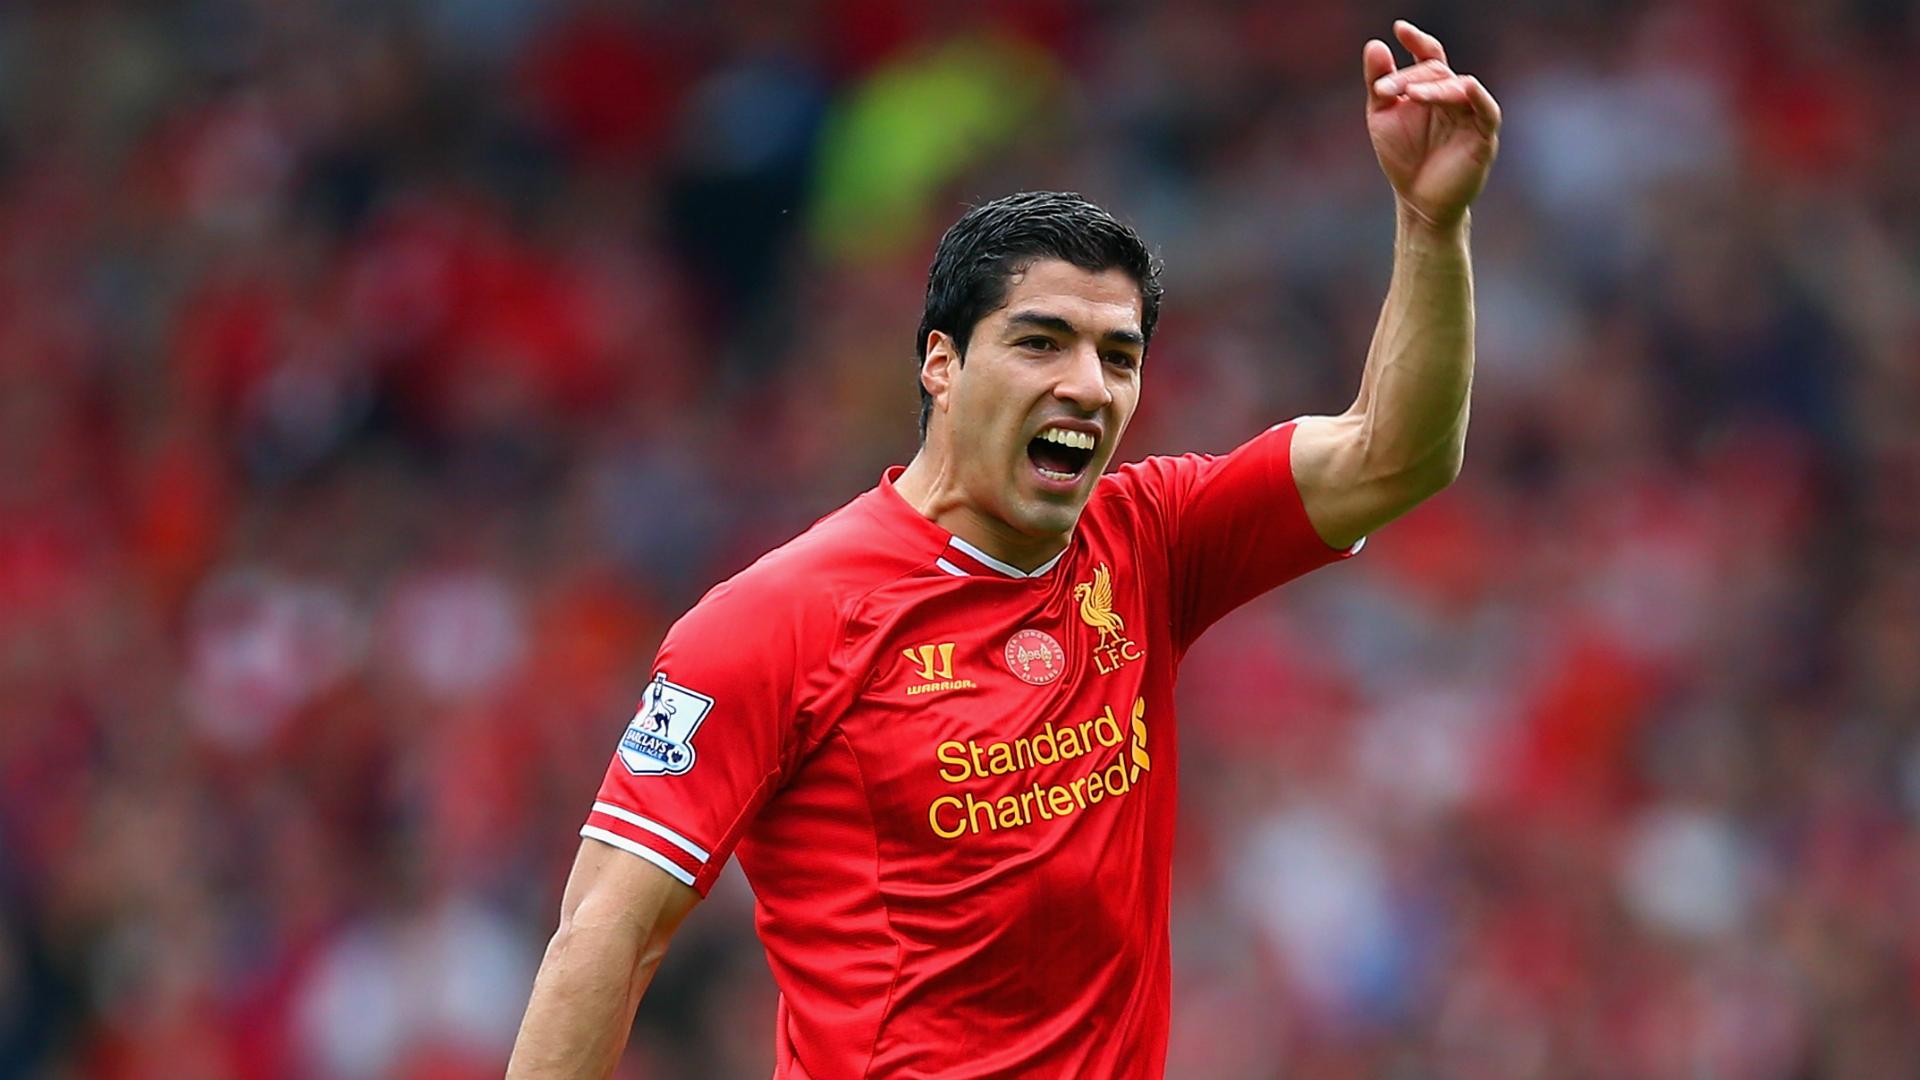 Rumour Has It: Liverpool preparing offer for Luis Suarez return, Real Madrid not keen on Ronaldo